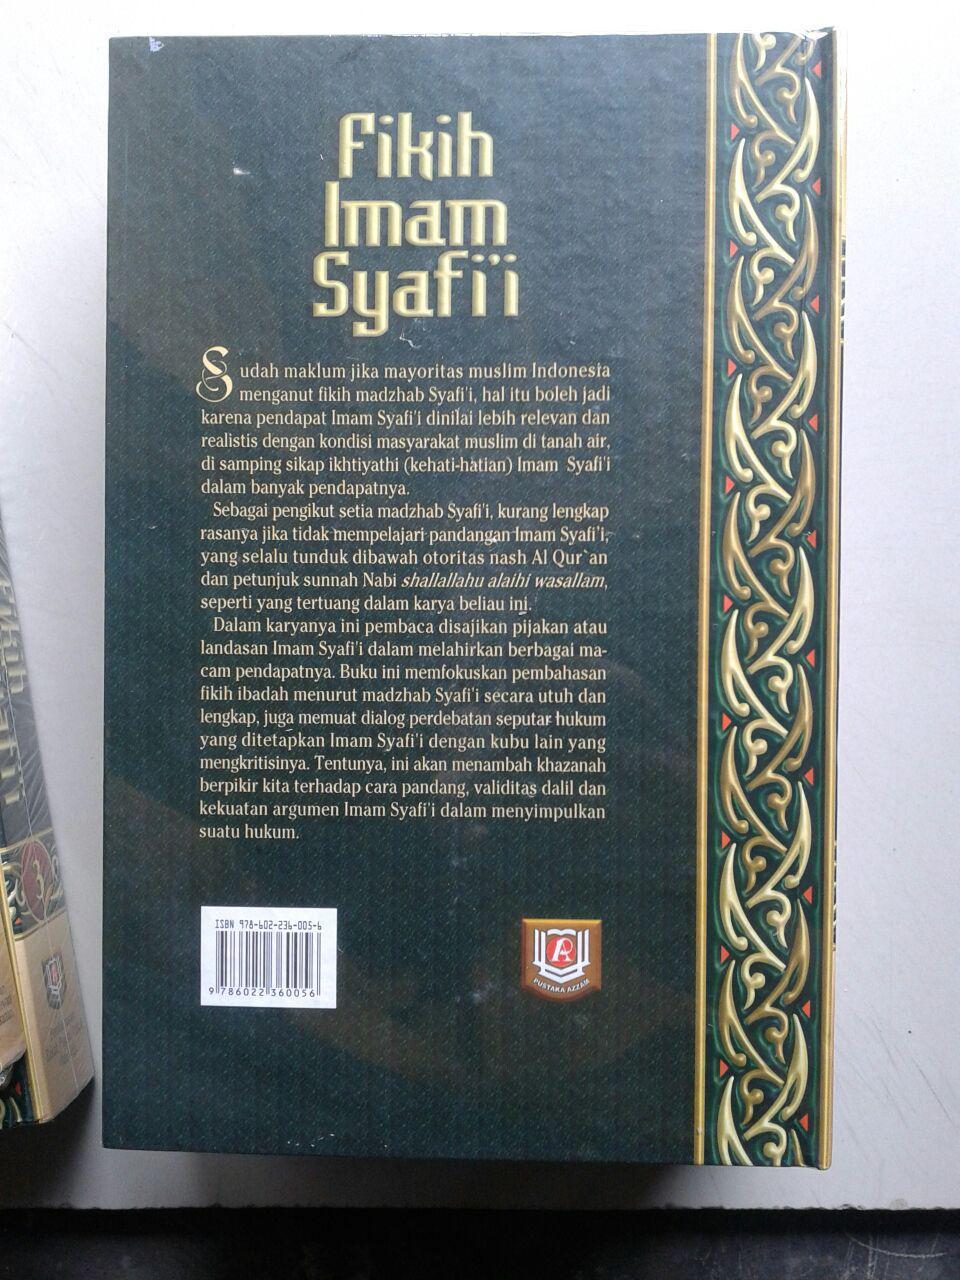 Buku Fikih Imam Syafi'i 1 Set 4 Jilid cover